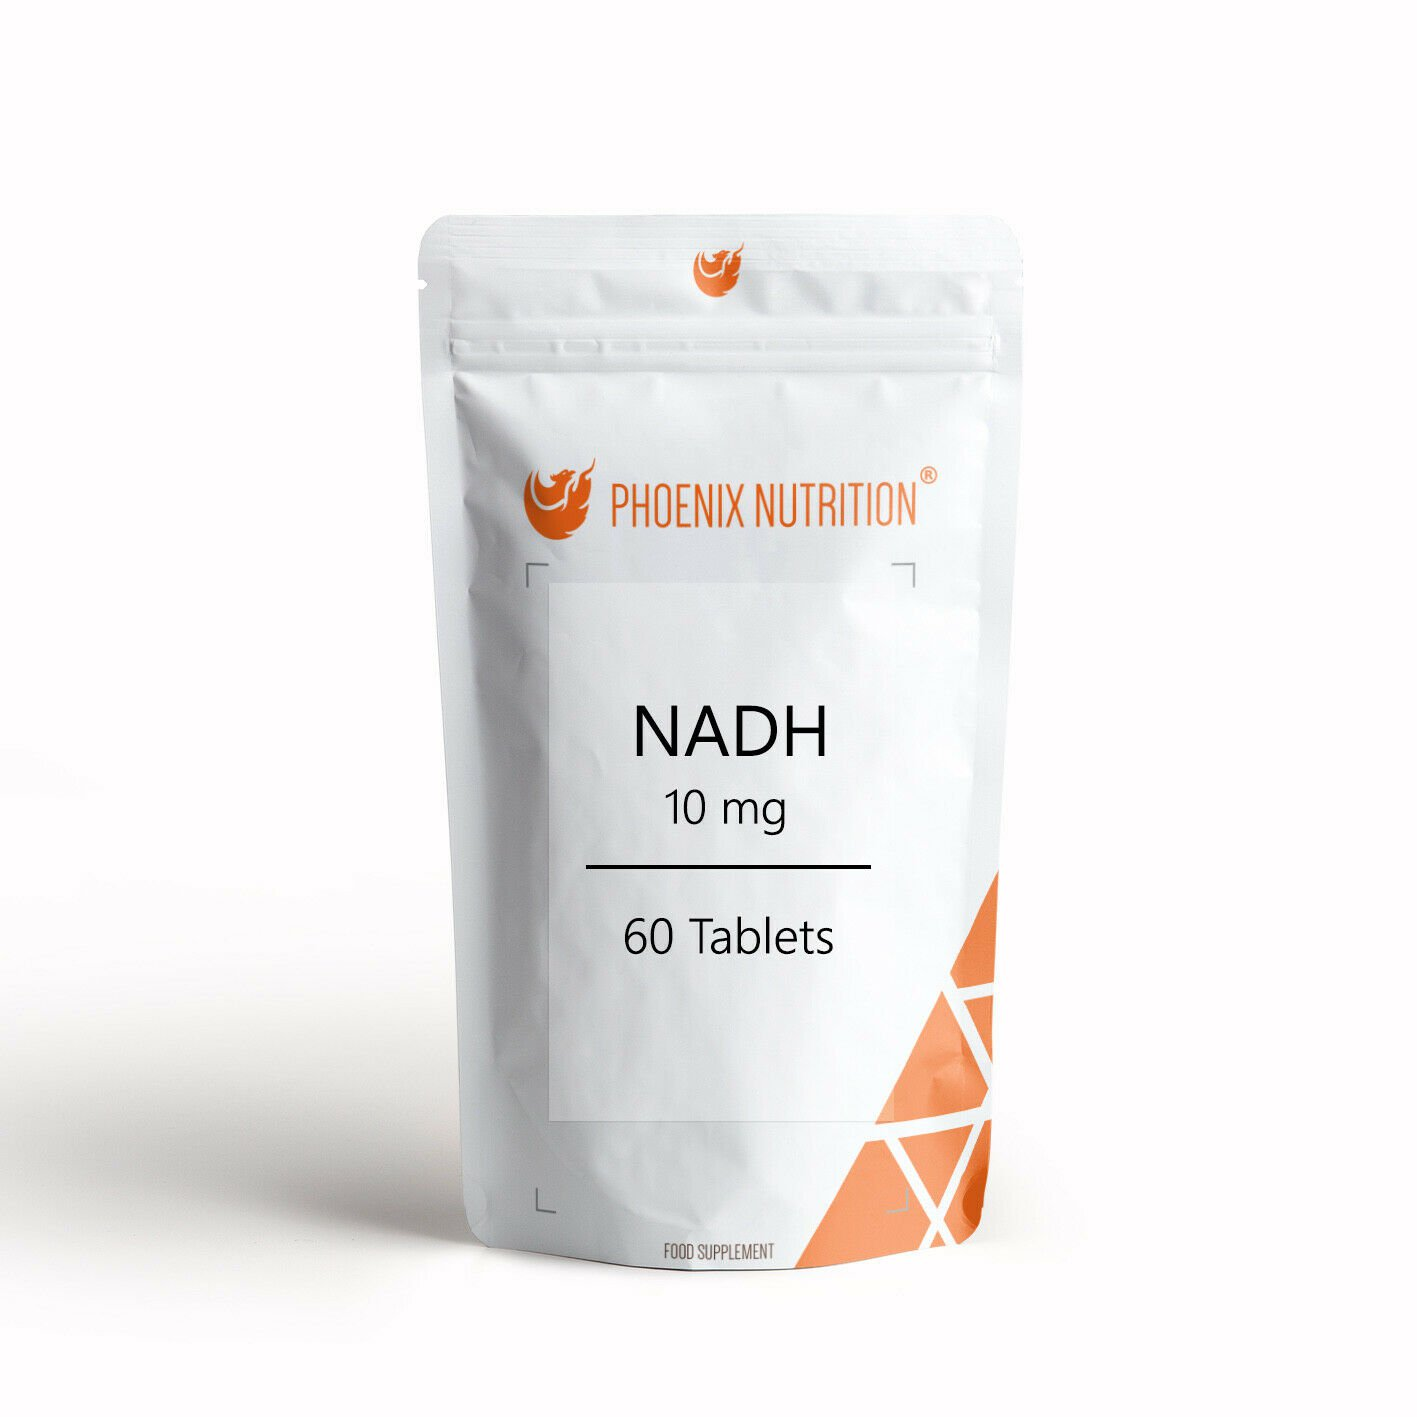 NADH 10mg x 60 Tablets - Nicotinamide Adenine Dinucleotide